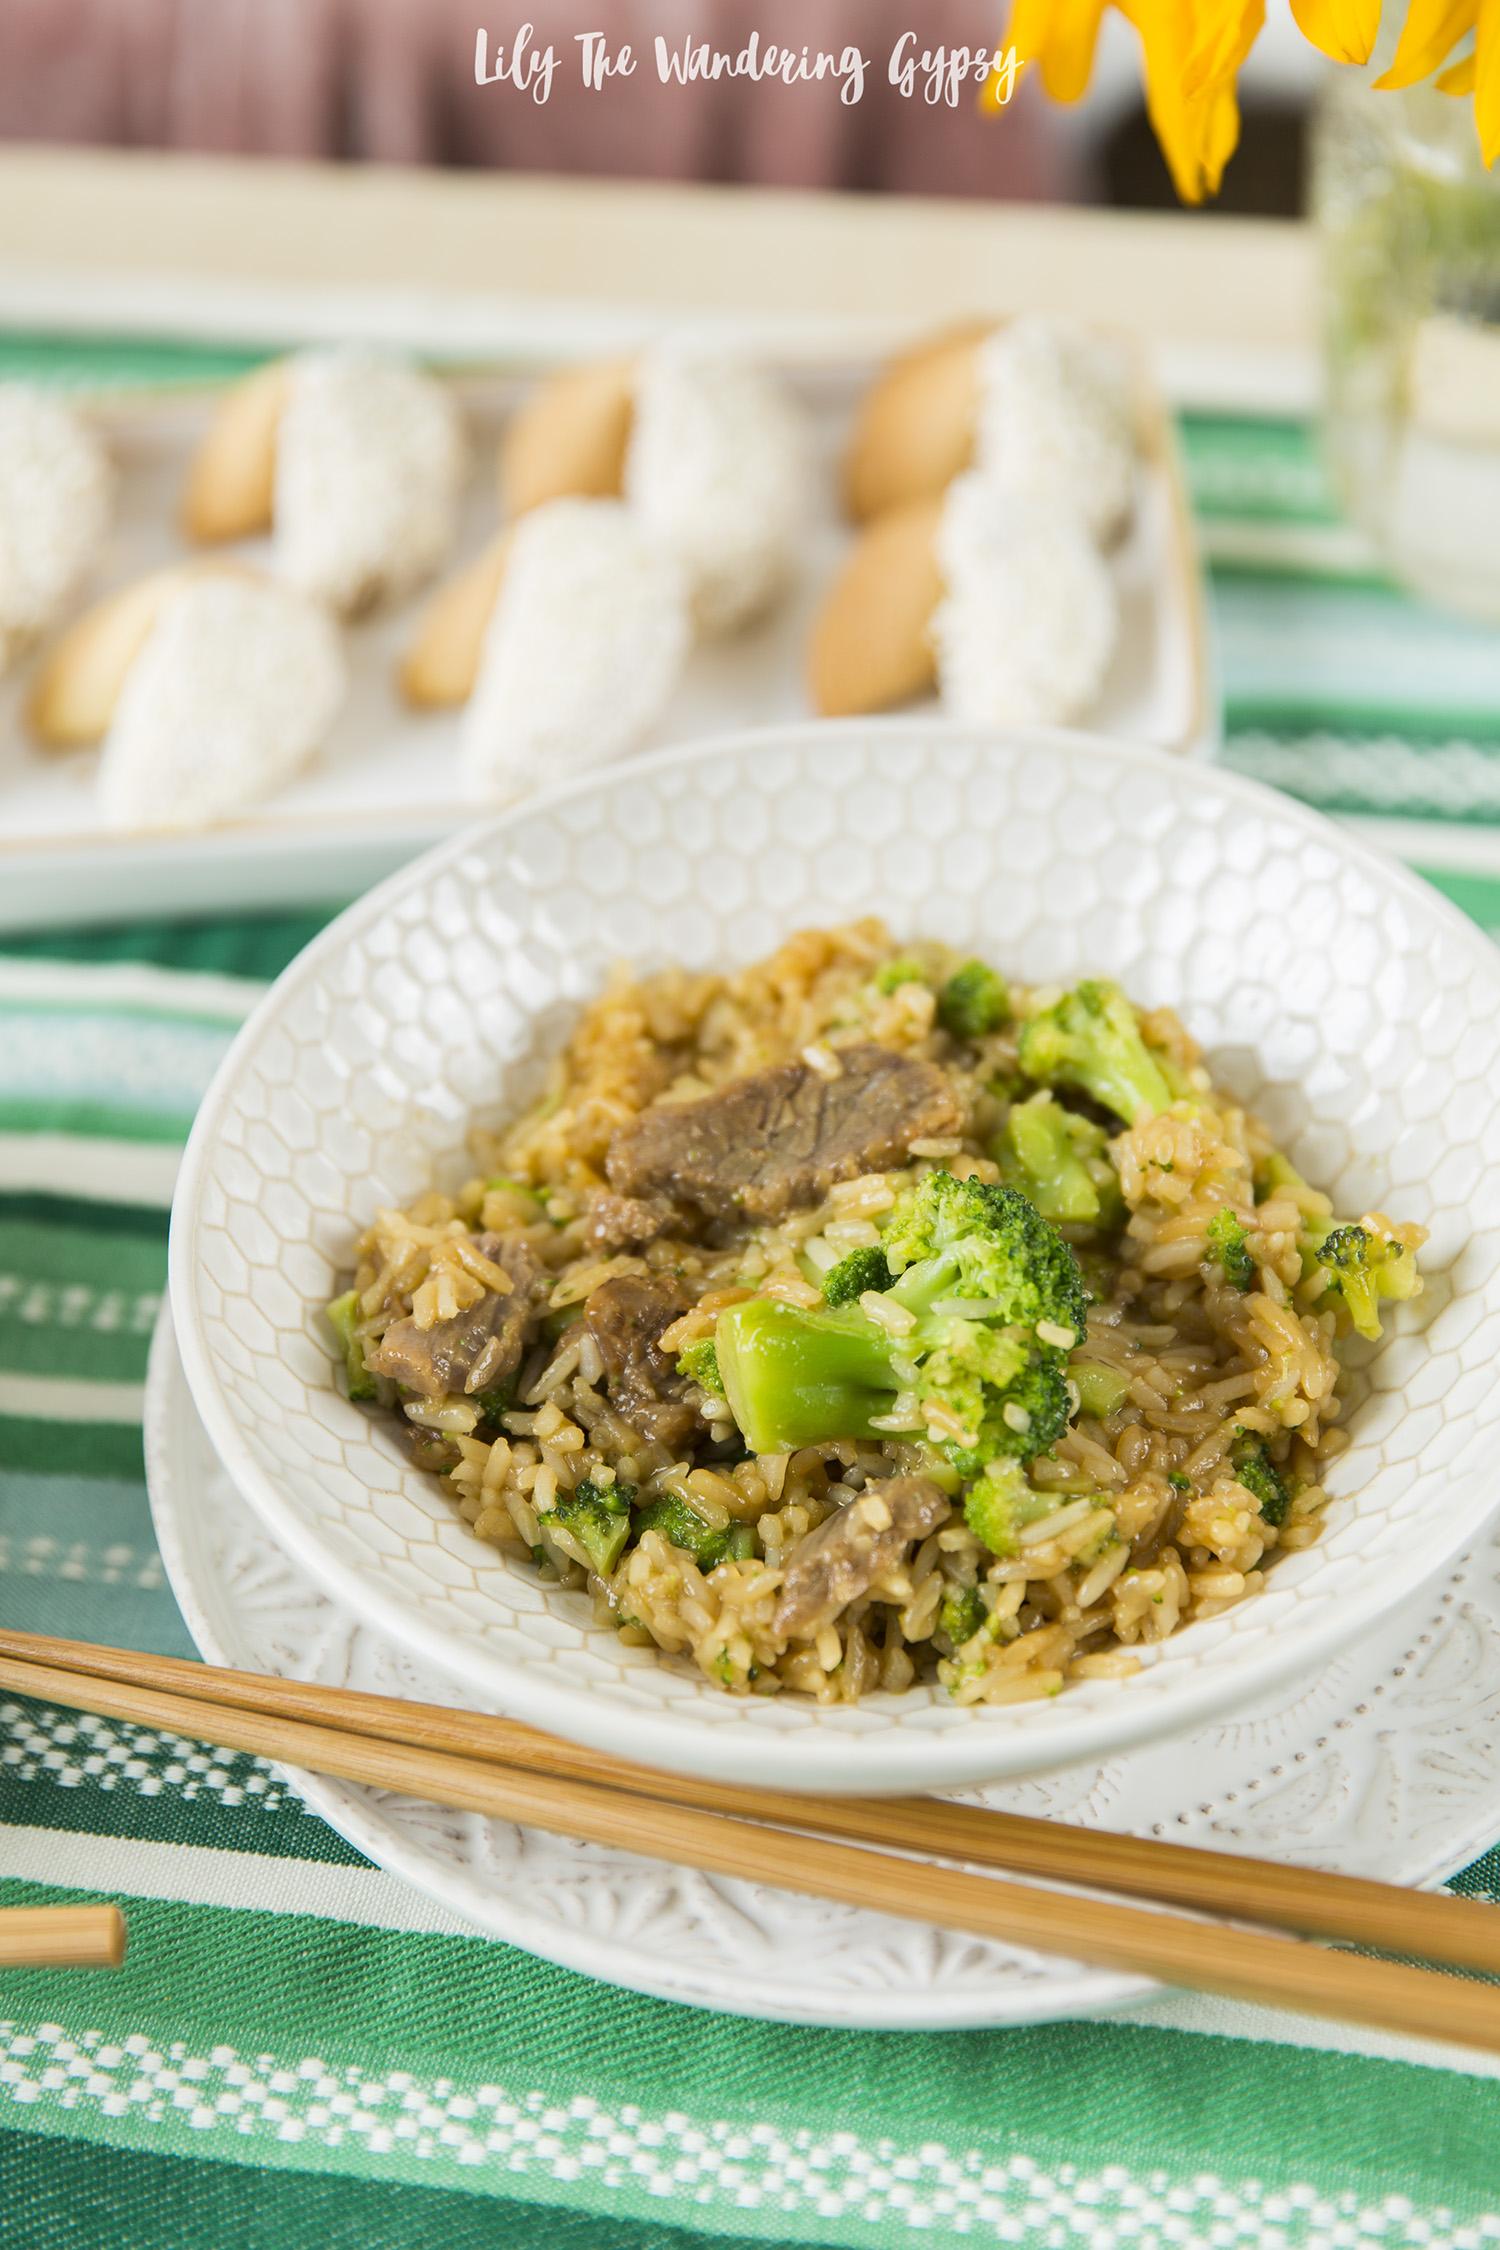 Broccoli Beef Fried Rice